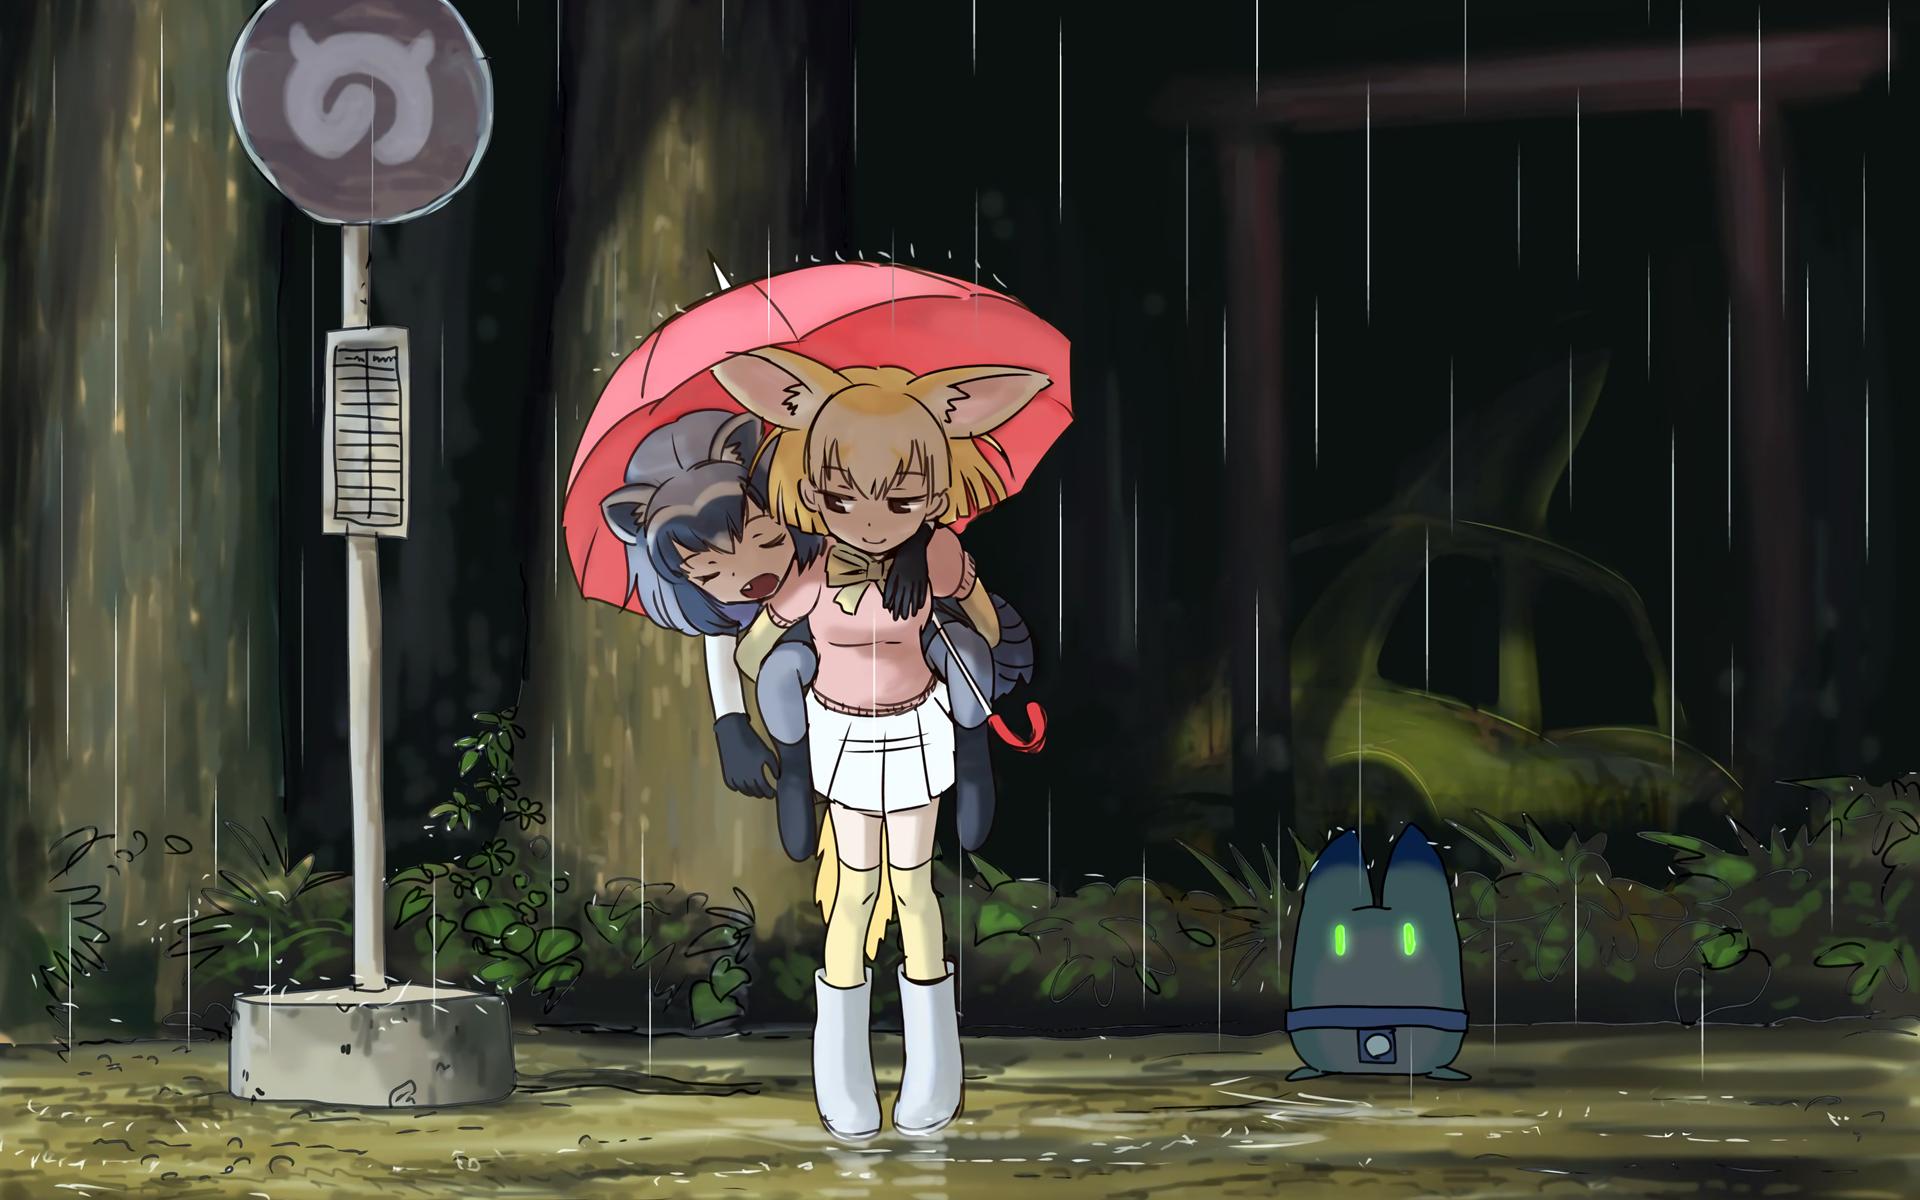 Anime 1920x1200 Kemono Friends Silver fox (Kemono friends) Red fox (Kemono friends) Lucky Beast (Kemono Friends) My Neighbor Totoro bus stop rain thigh-highs red umbrella robot sleepy animal ears tail waifu2x